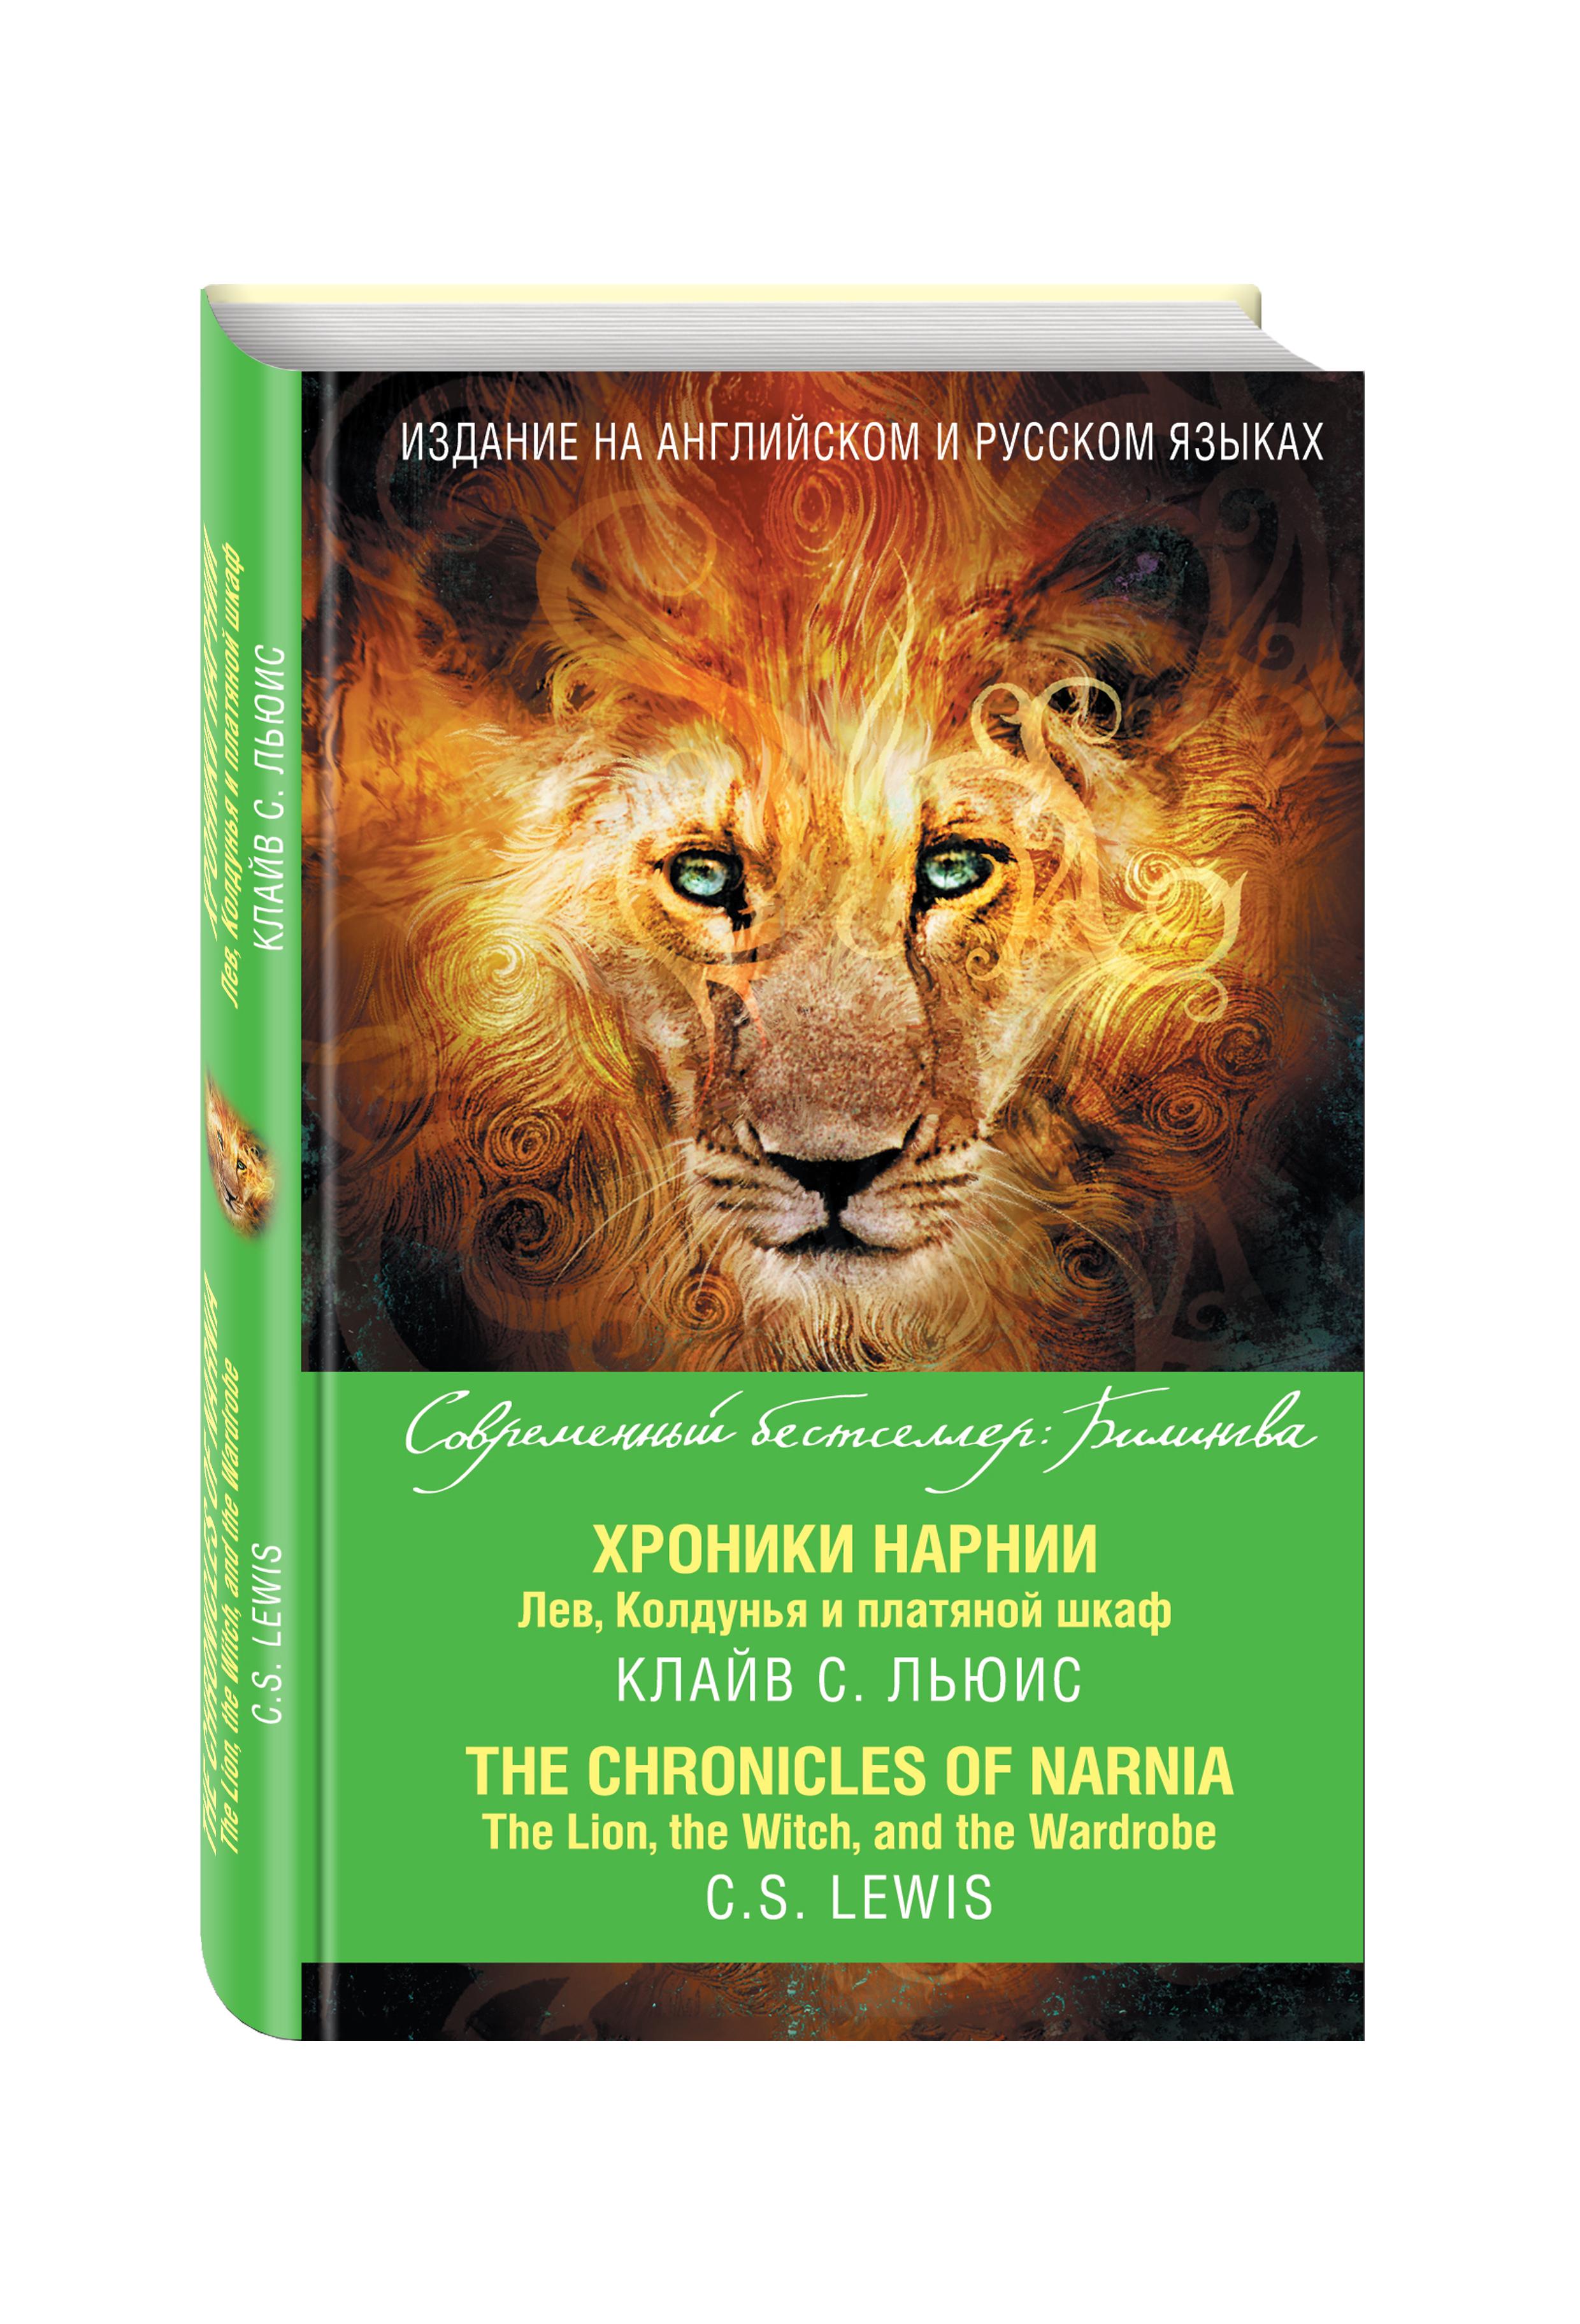 Клайв С. Льюис Хроники Нарнии. Лев, Колдунья и платяной шкаф = The Chronicles of Narnia. The Lion, the Witch, and the Wardrobe цены онлайн